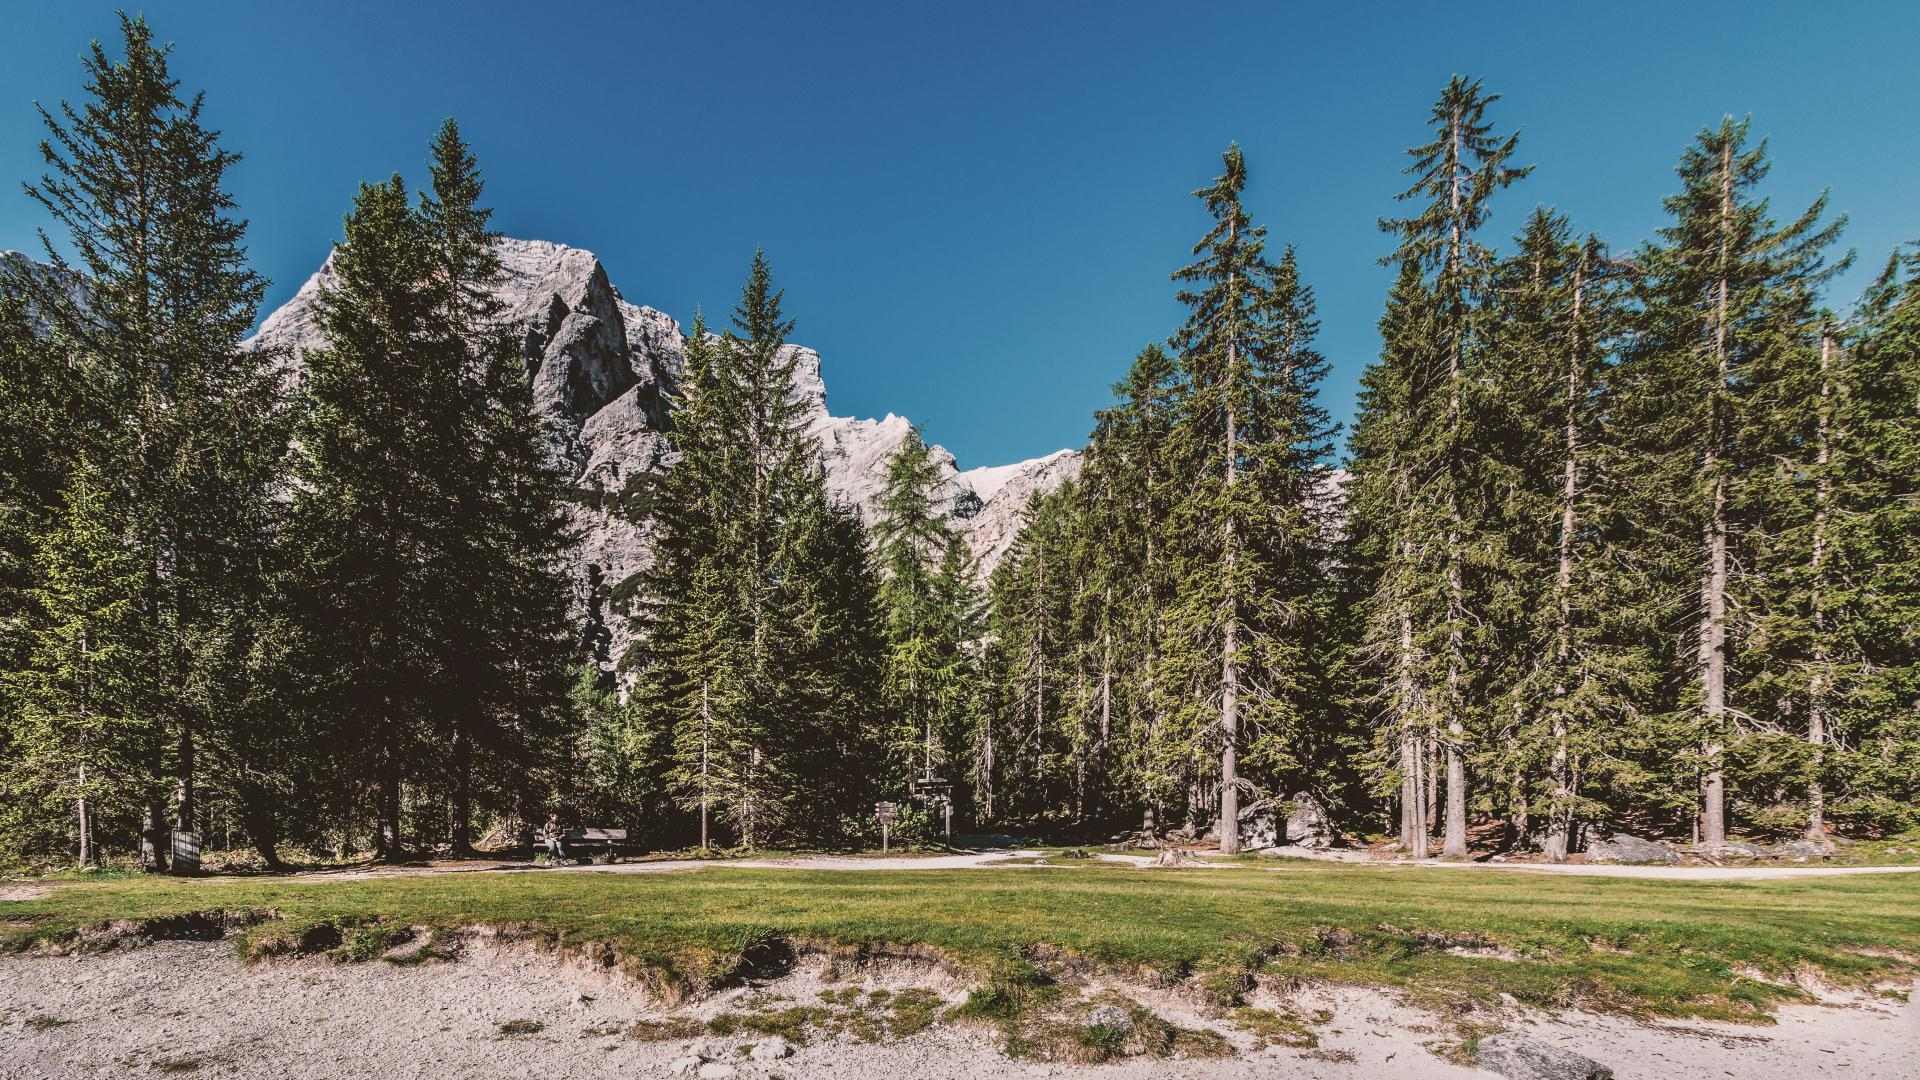 hd hintergrundbilder gras bäume wald 1920x1080